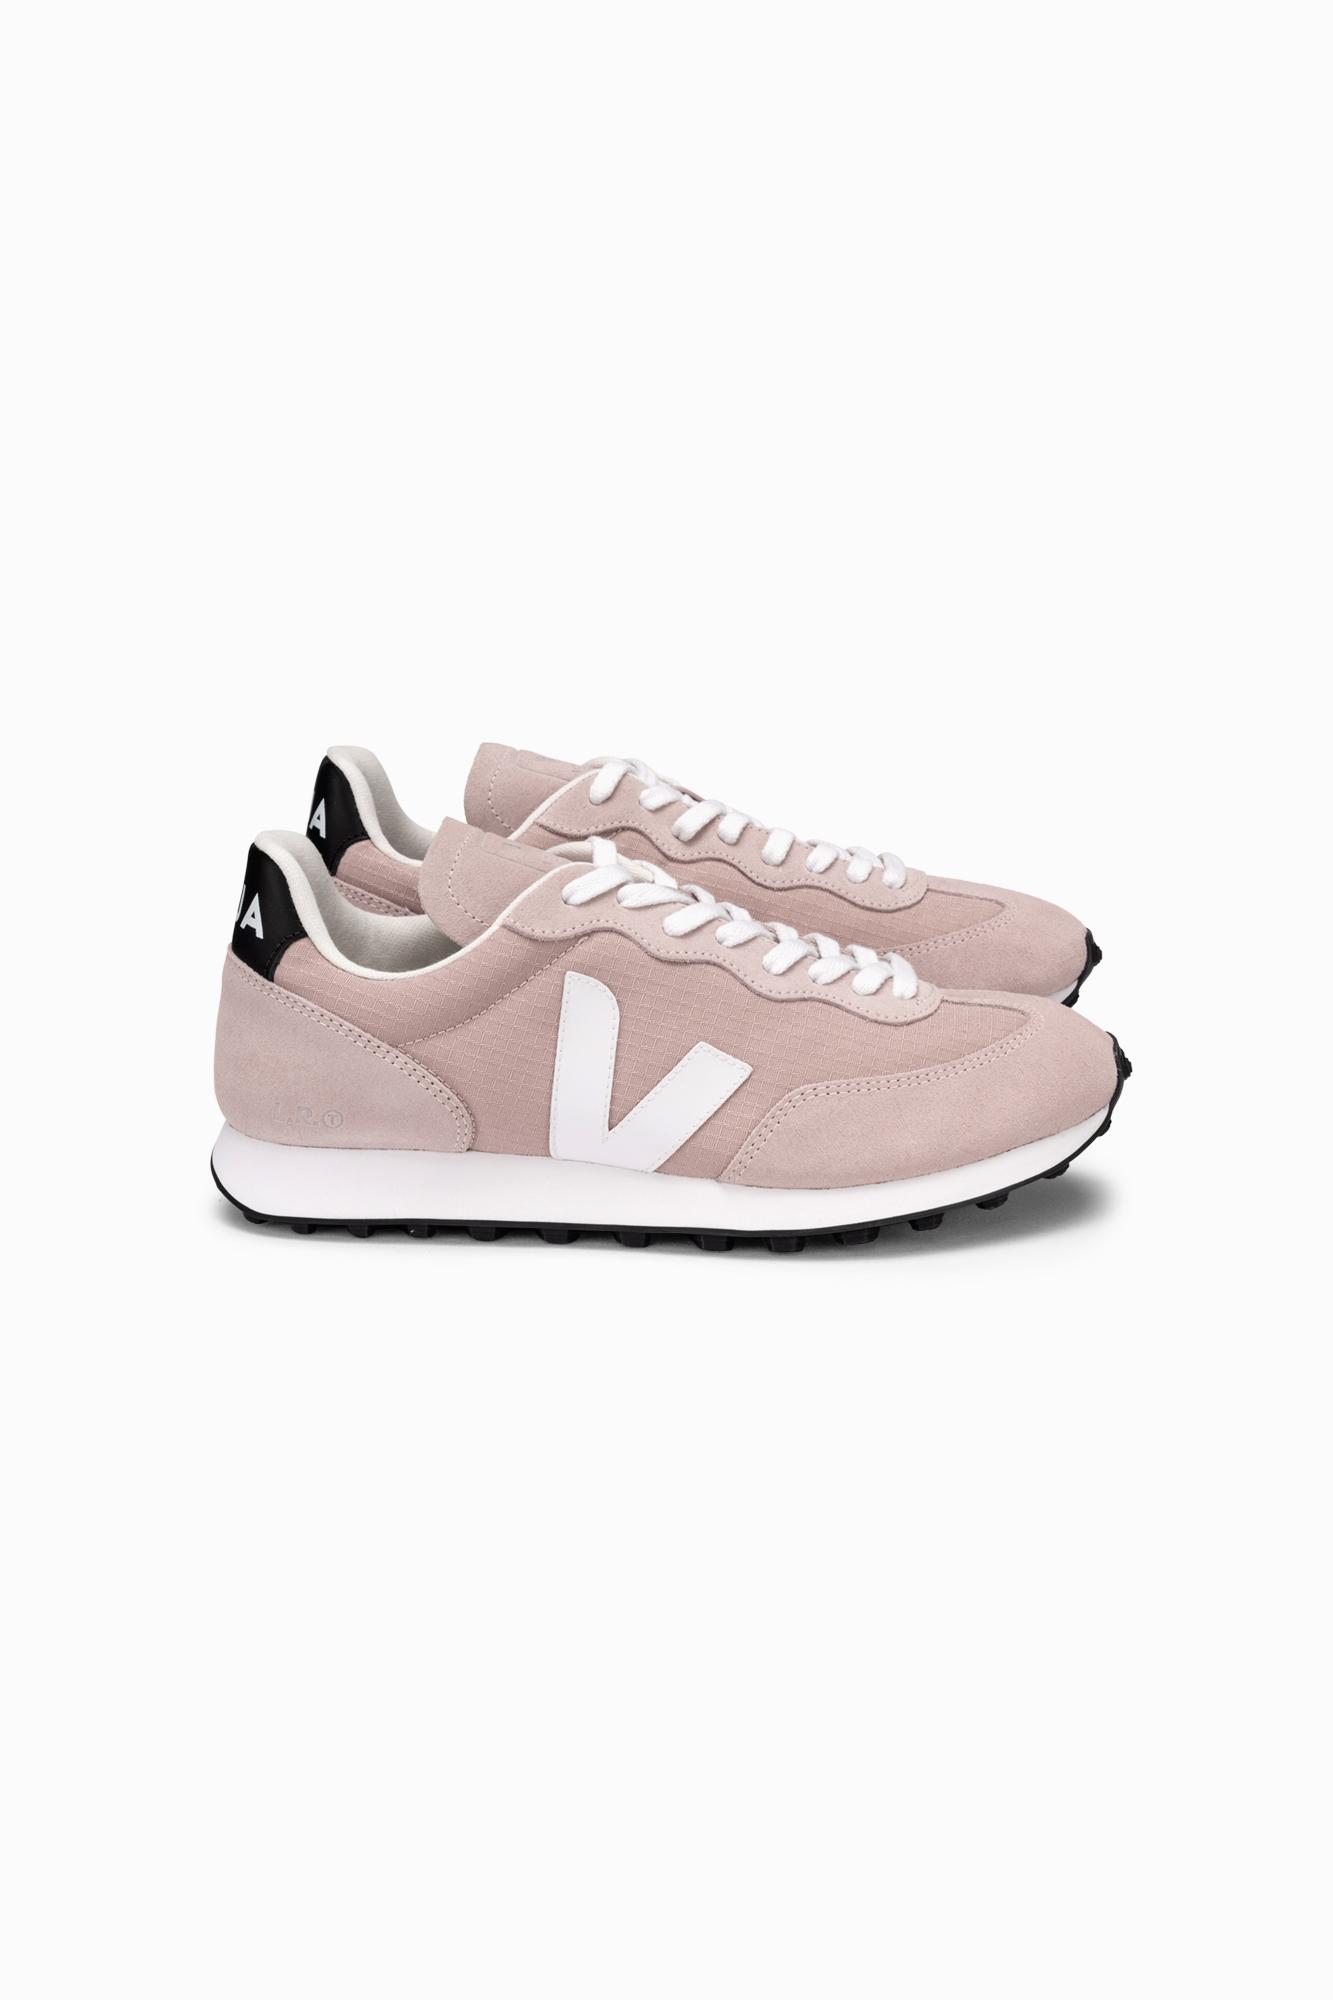 Rio Branco Ripstop Sneaker